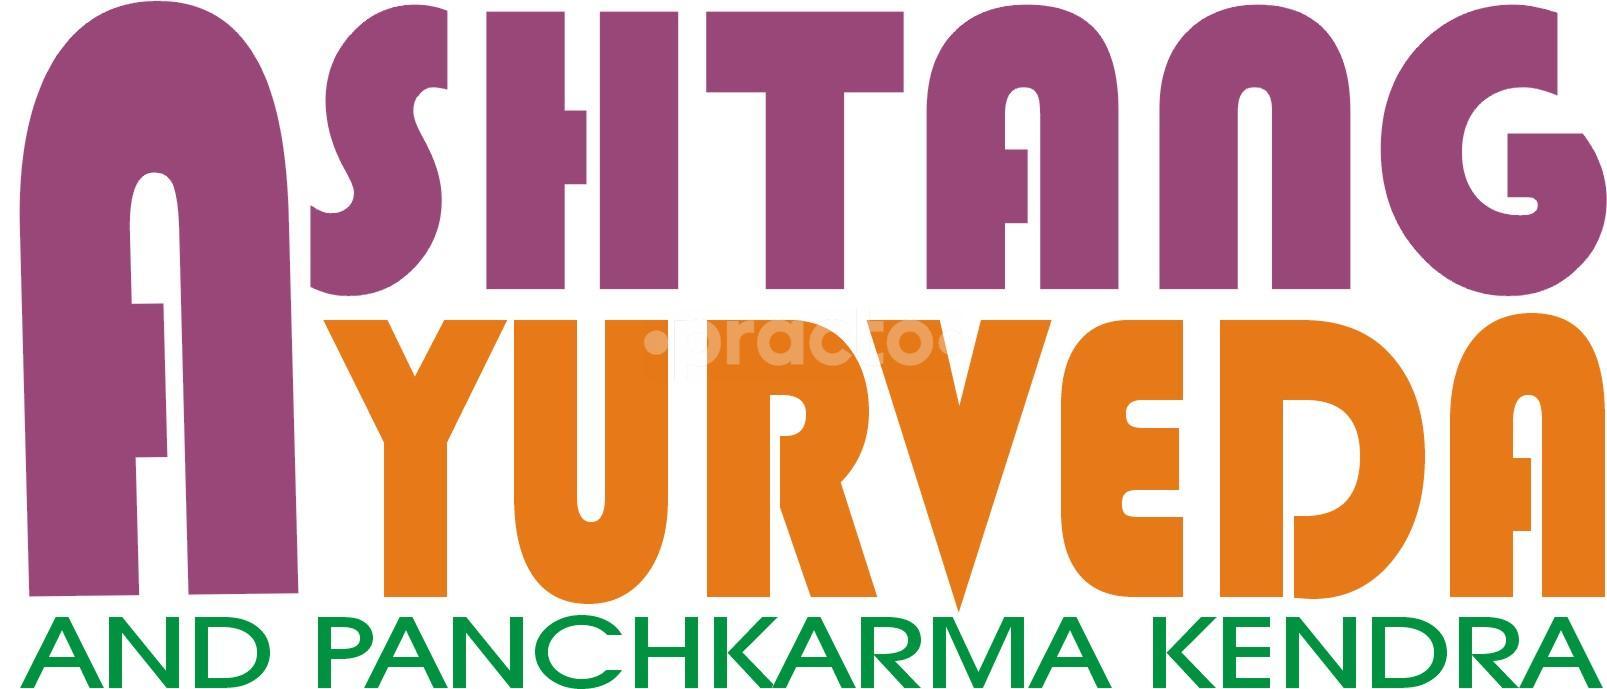 Ashtang Ayurveda And Panchkarma Kendra